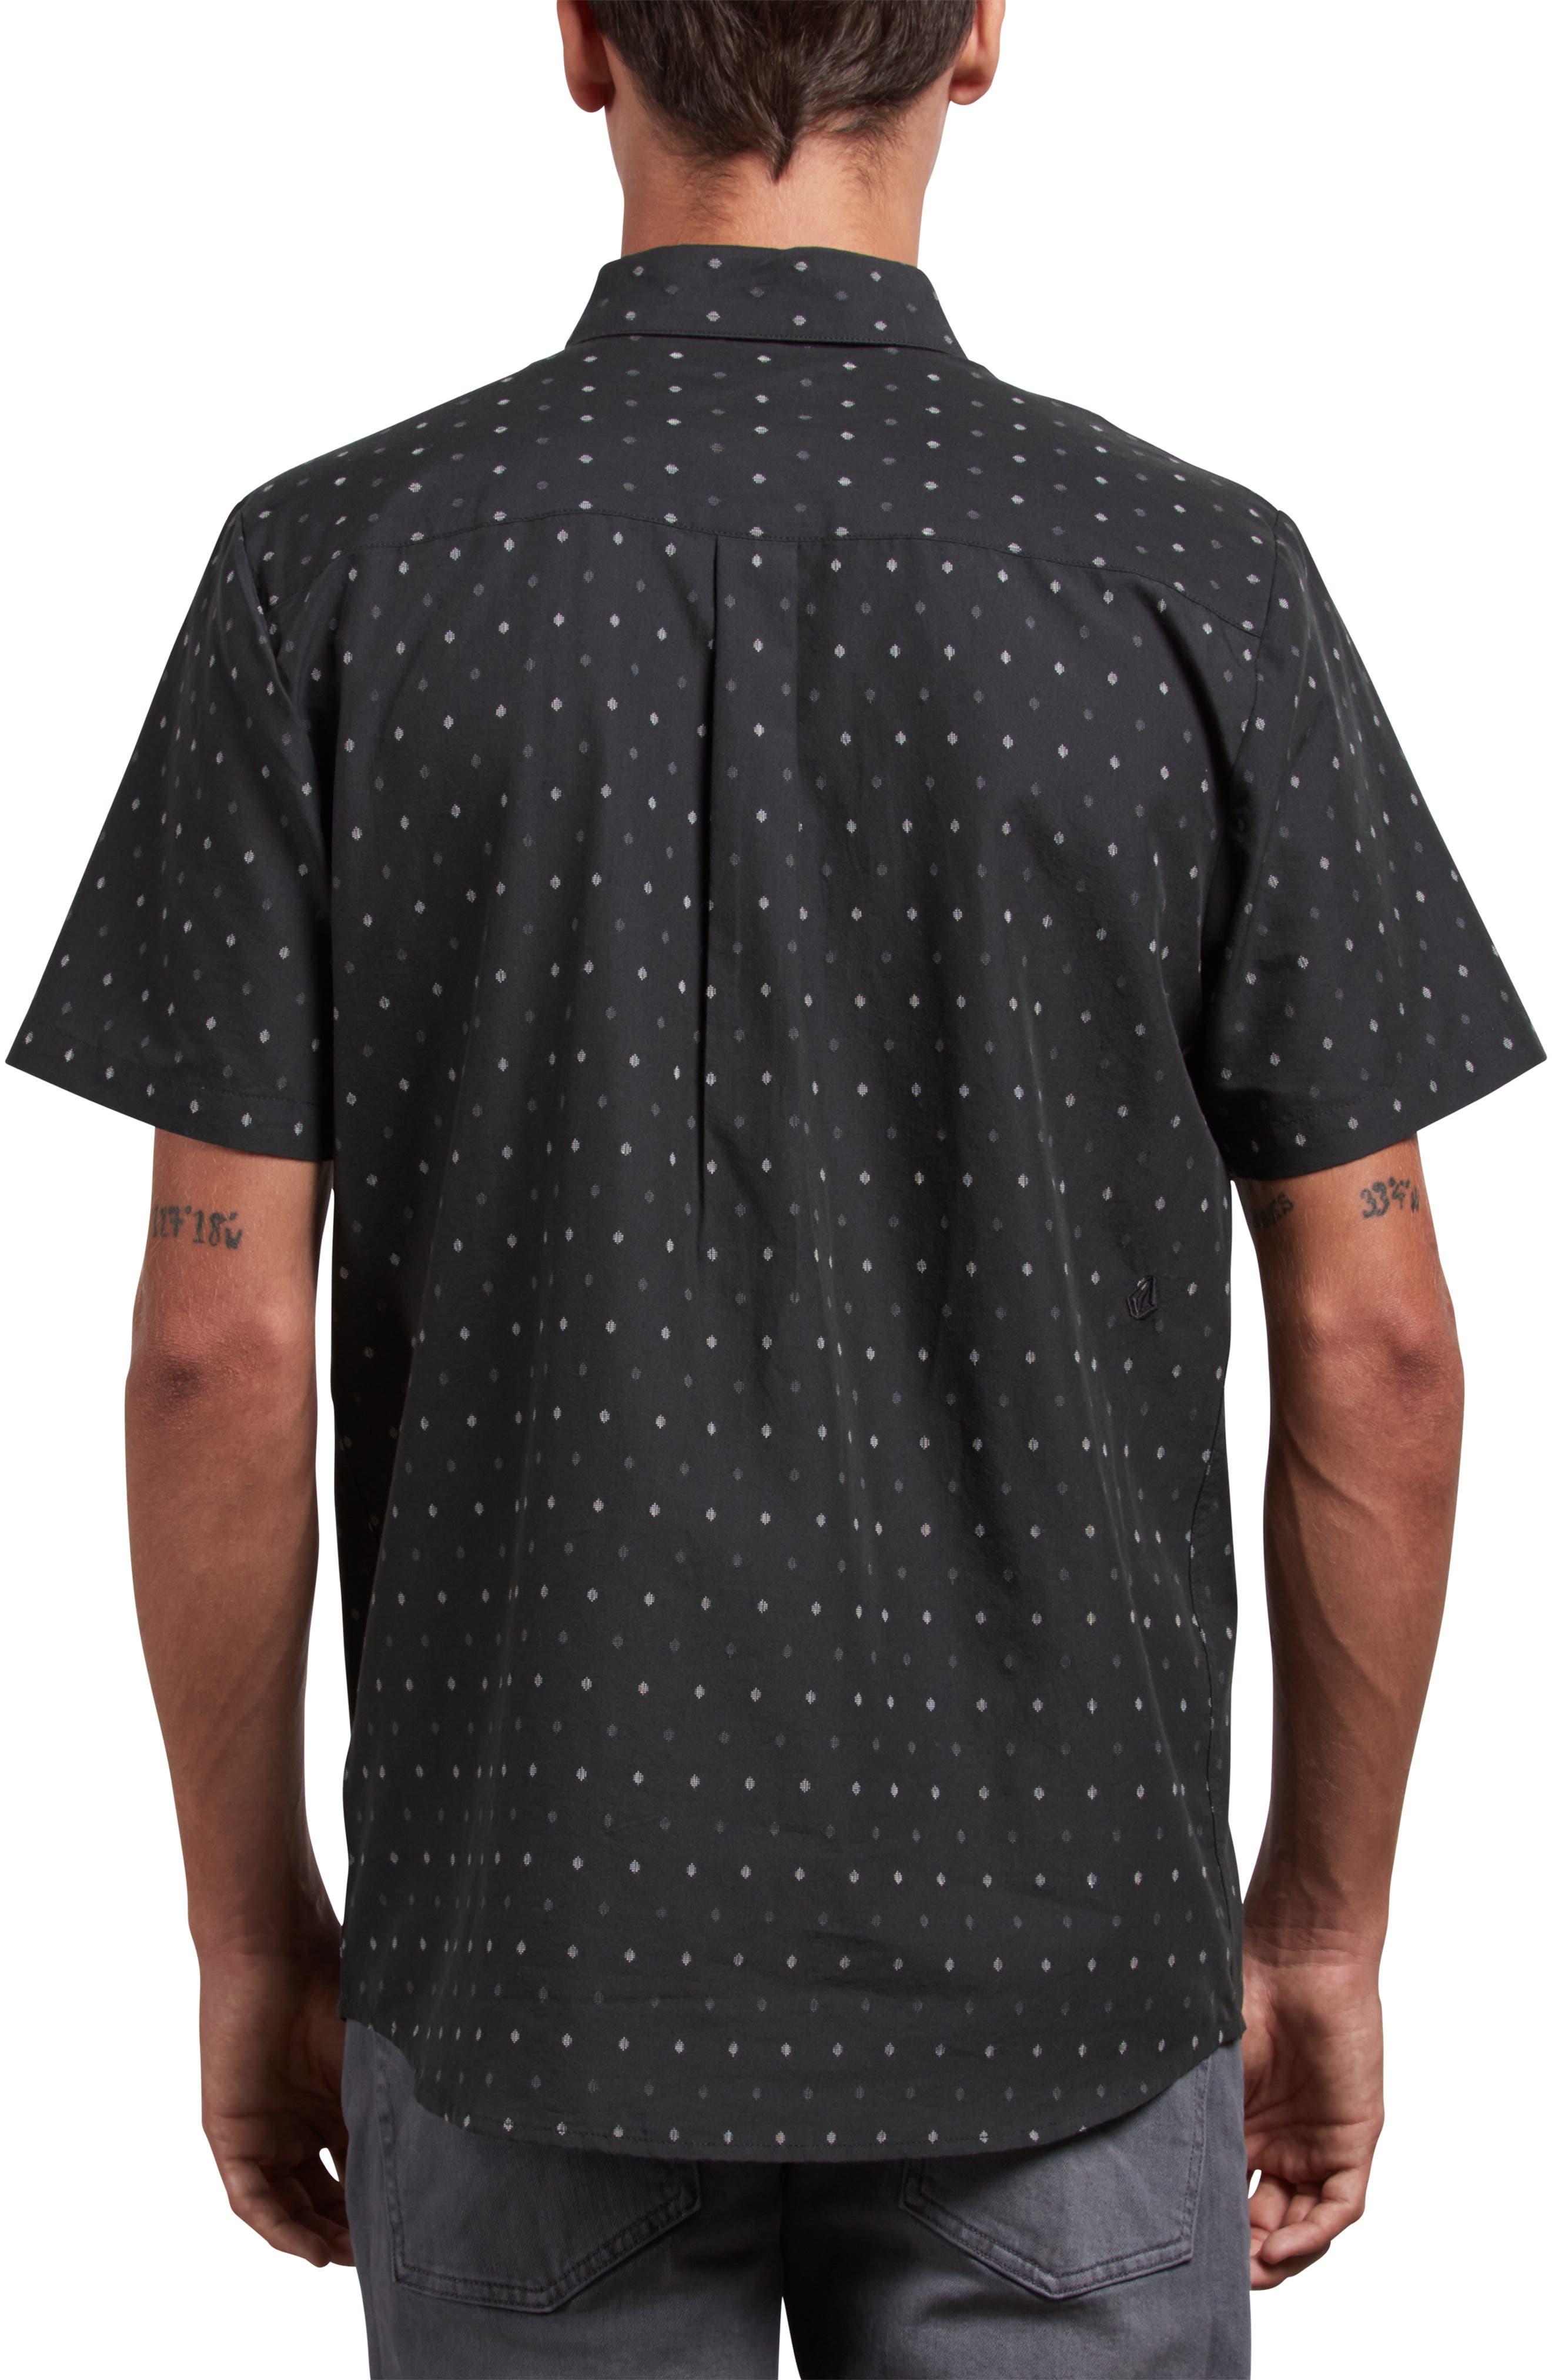 Frequency Dot Short Sleeve Woven Shirt,                             Alternate thumbnail 2, color,                             020